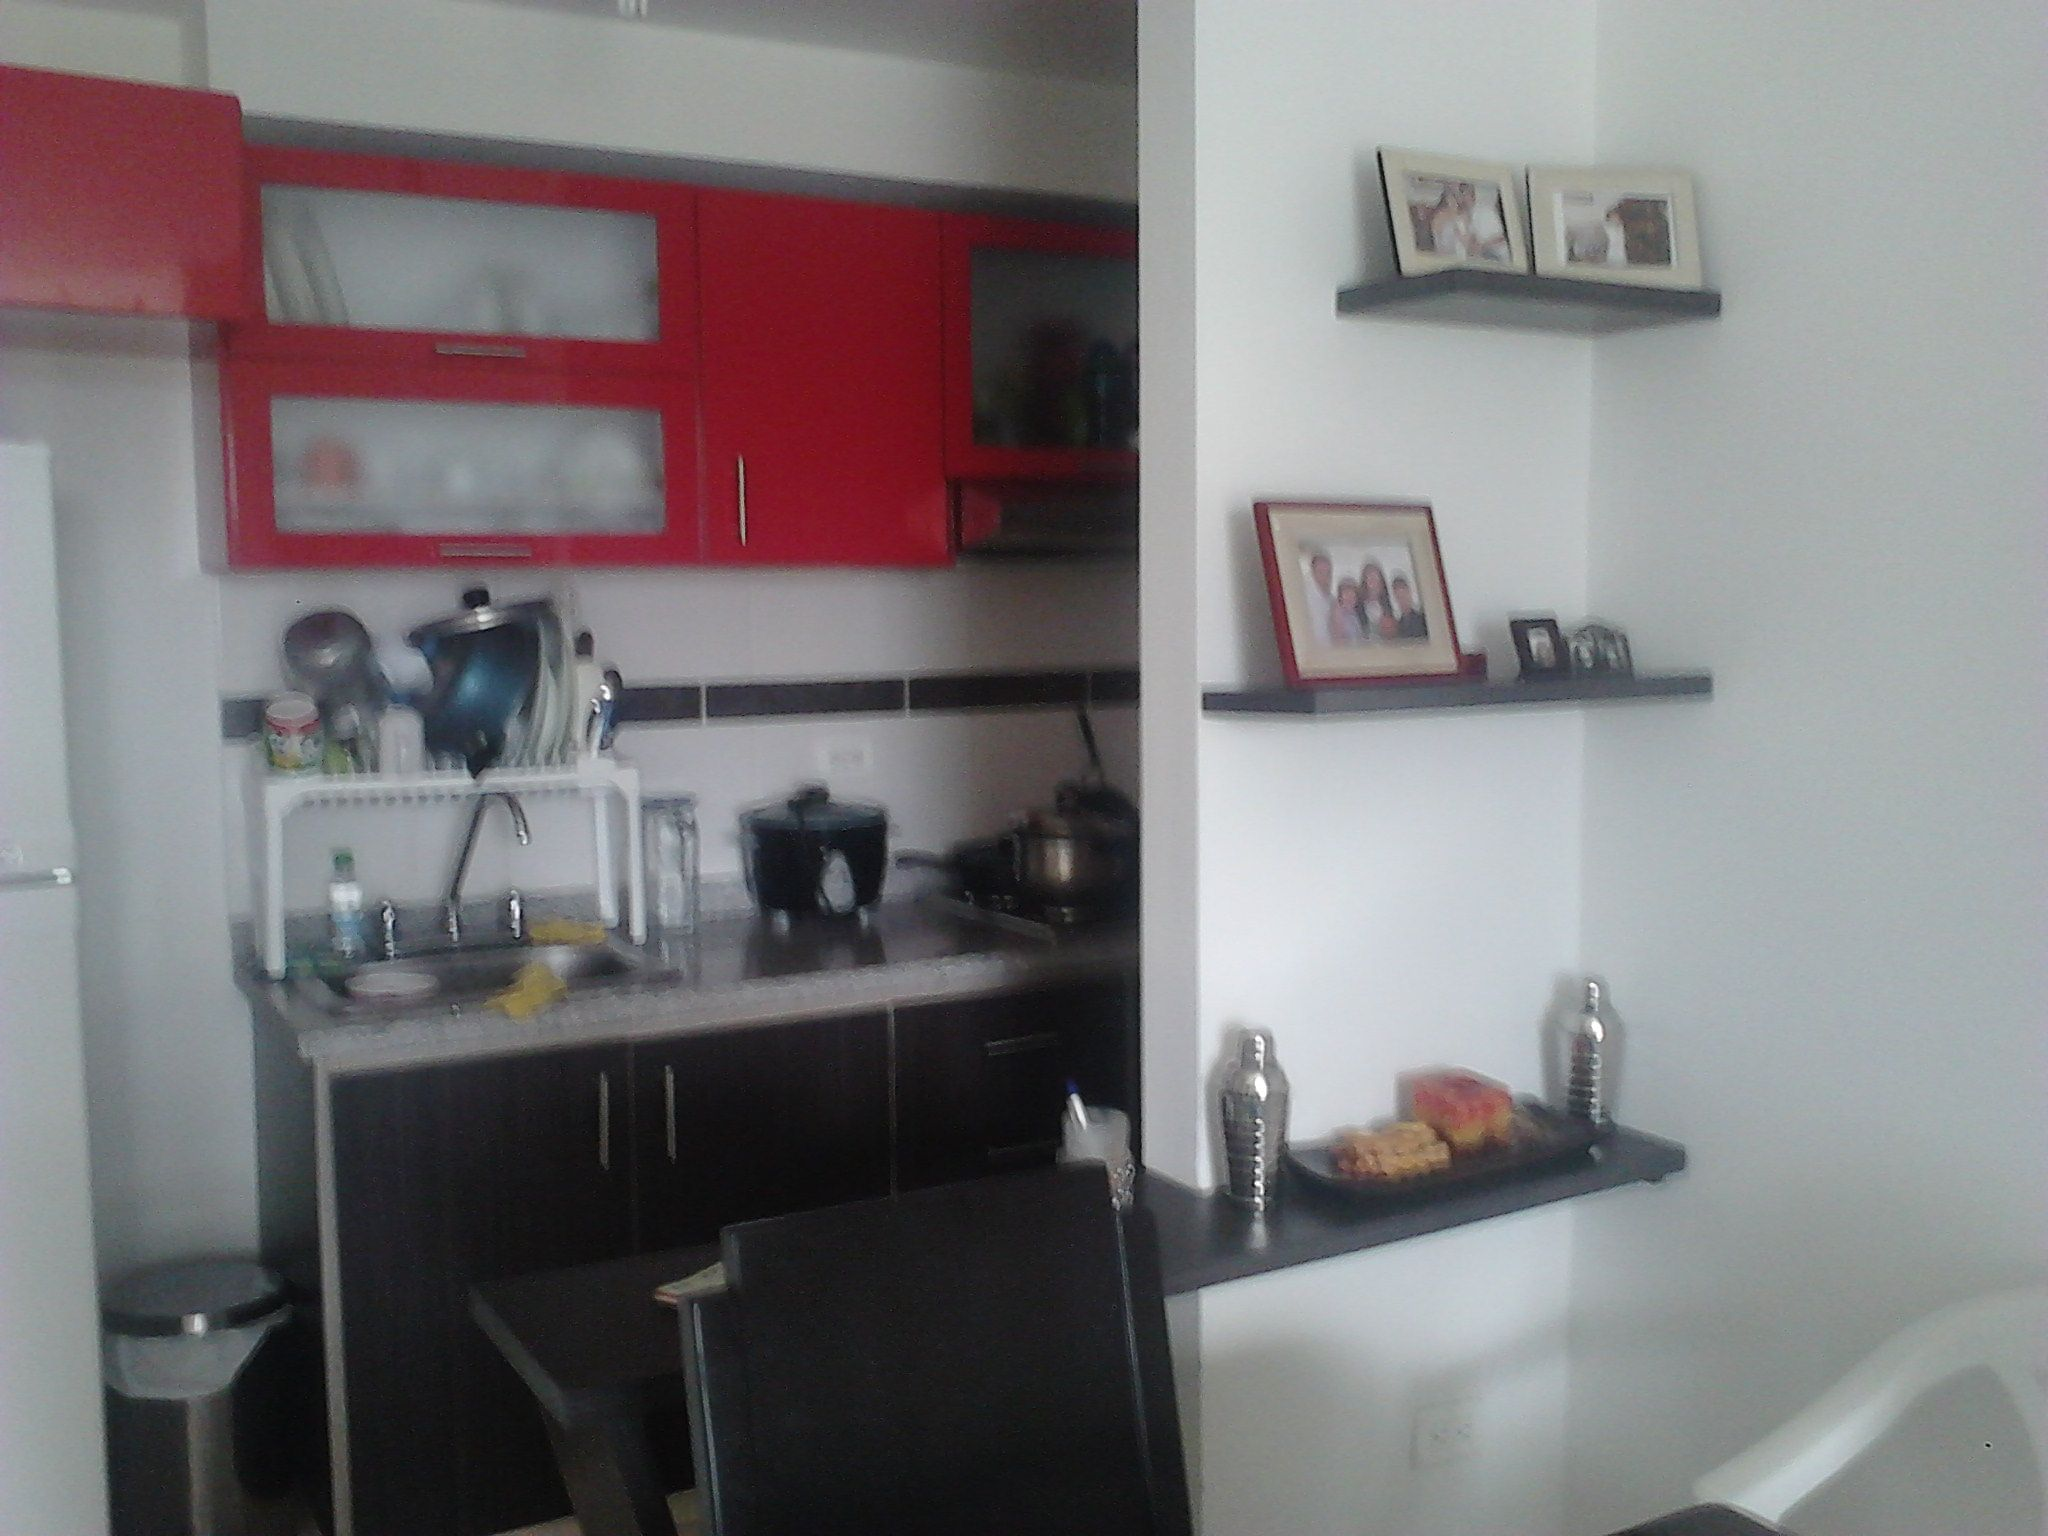 Cocina integral: Mueble superior de cocina en rojo e inferior en ...